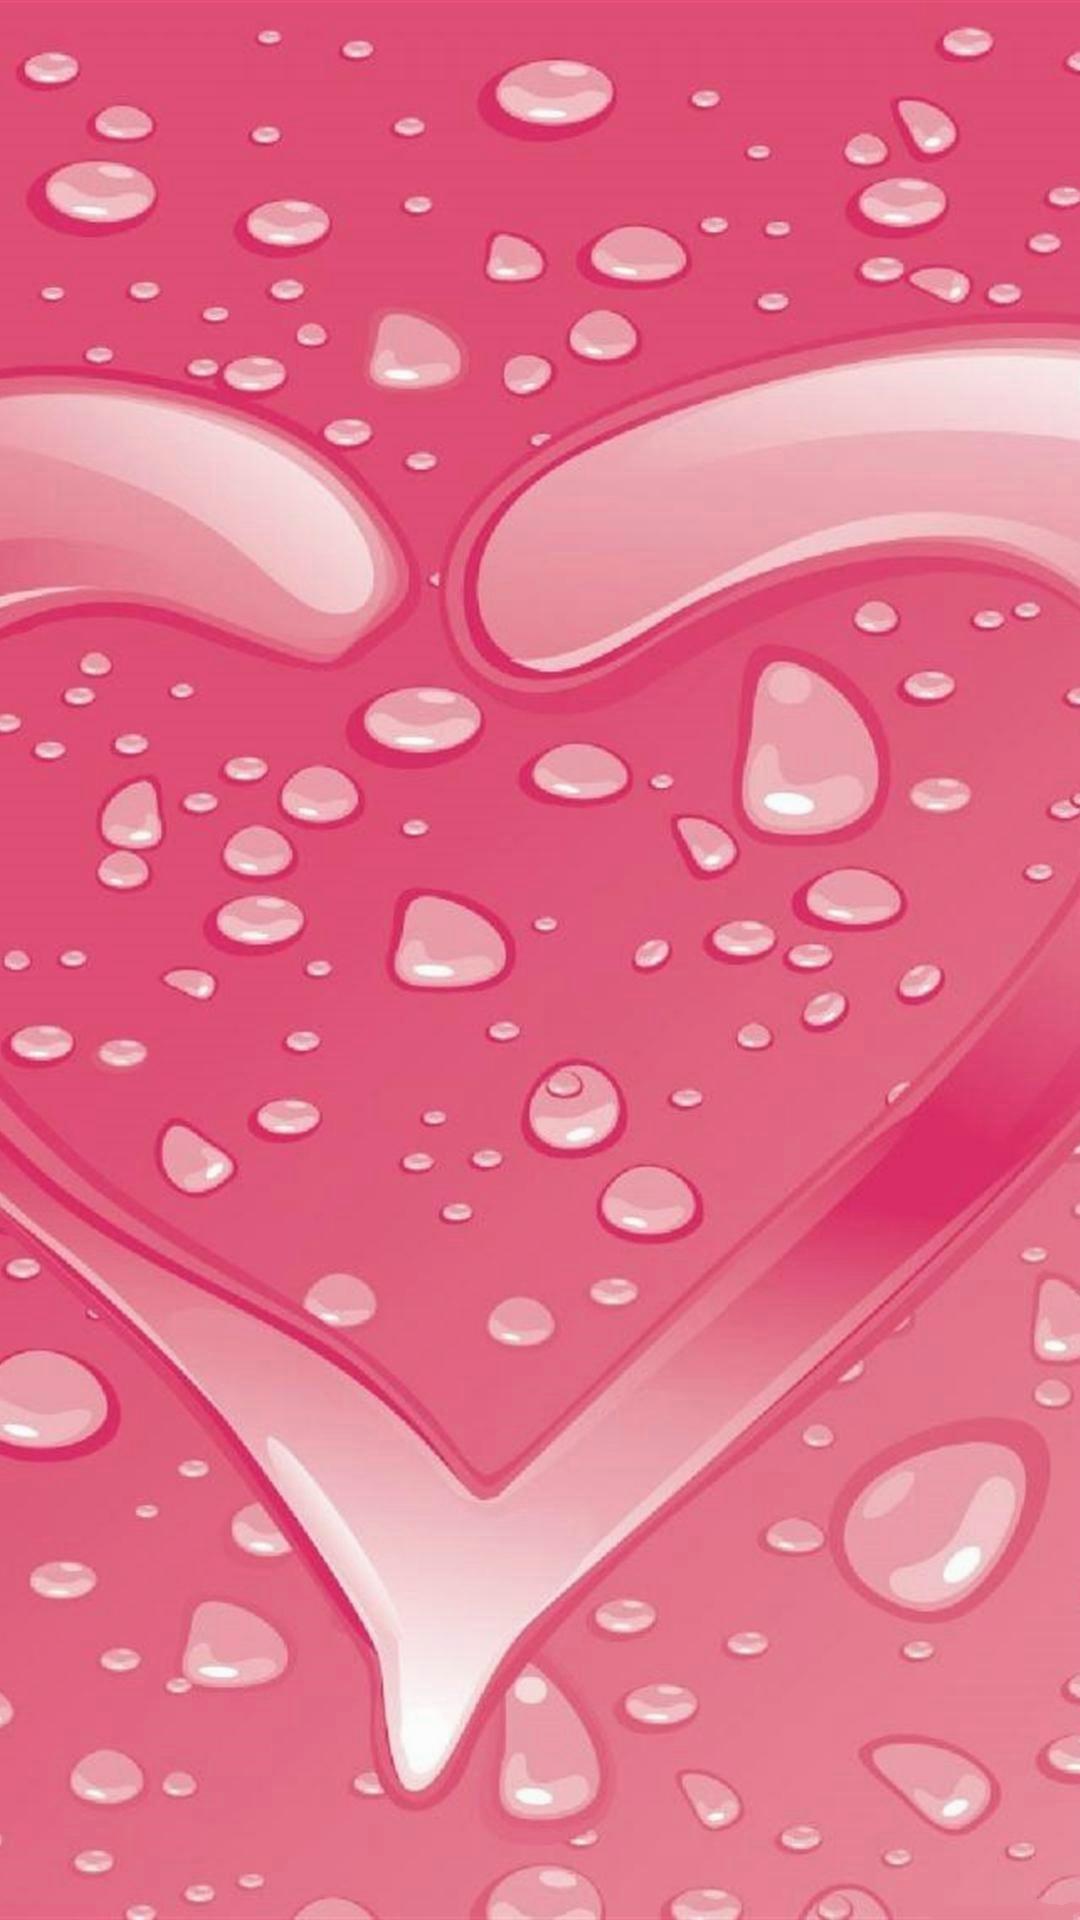 wallpaper.wiki-Cool-Pink-Iphone-Wallpaper-PIC-WPB0012154